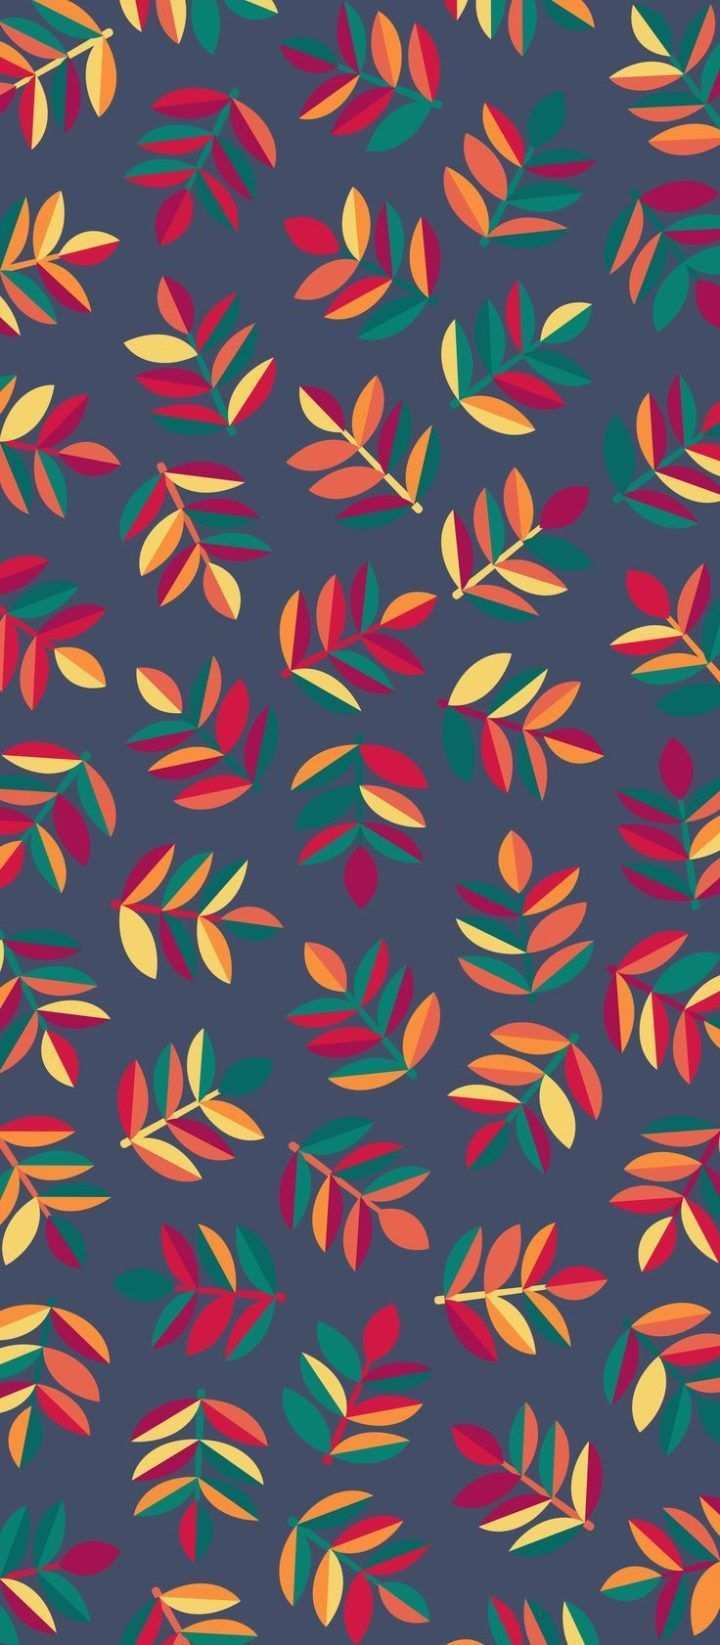 Ash Ashfall Aut M5a Pattern Patterndesign Patternprint Phonebackgroundstumblrautumn Russfuss In 2020 Fall Wallpaper Iphone Wallpaper Pattern Pattern Wallpaper